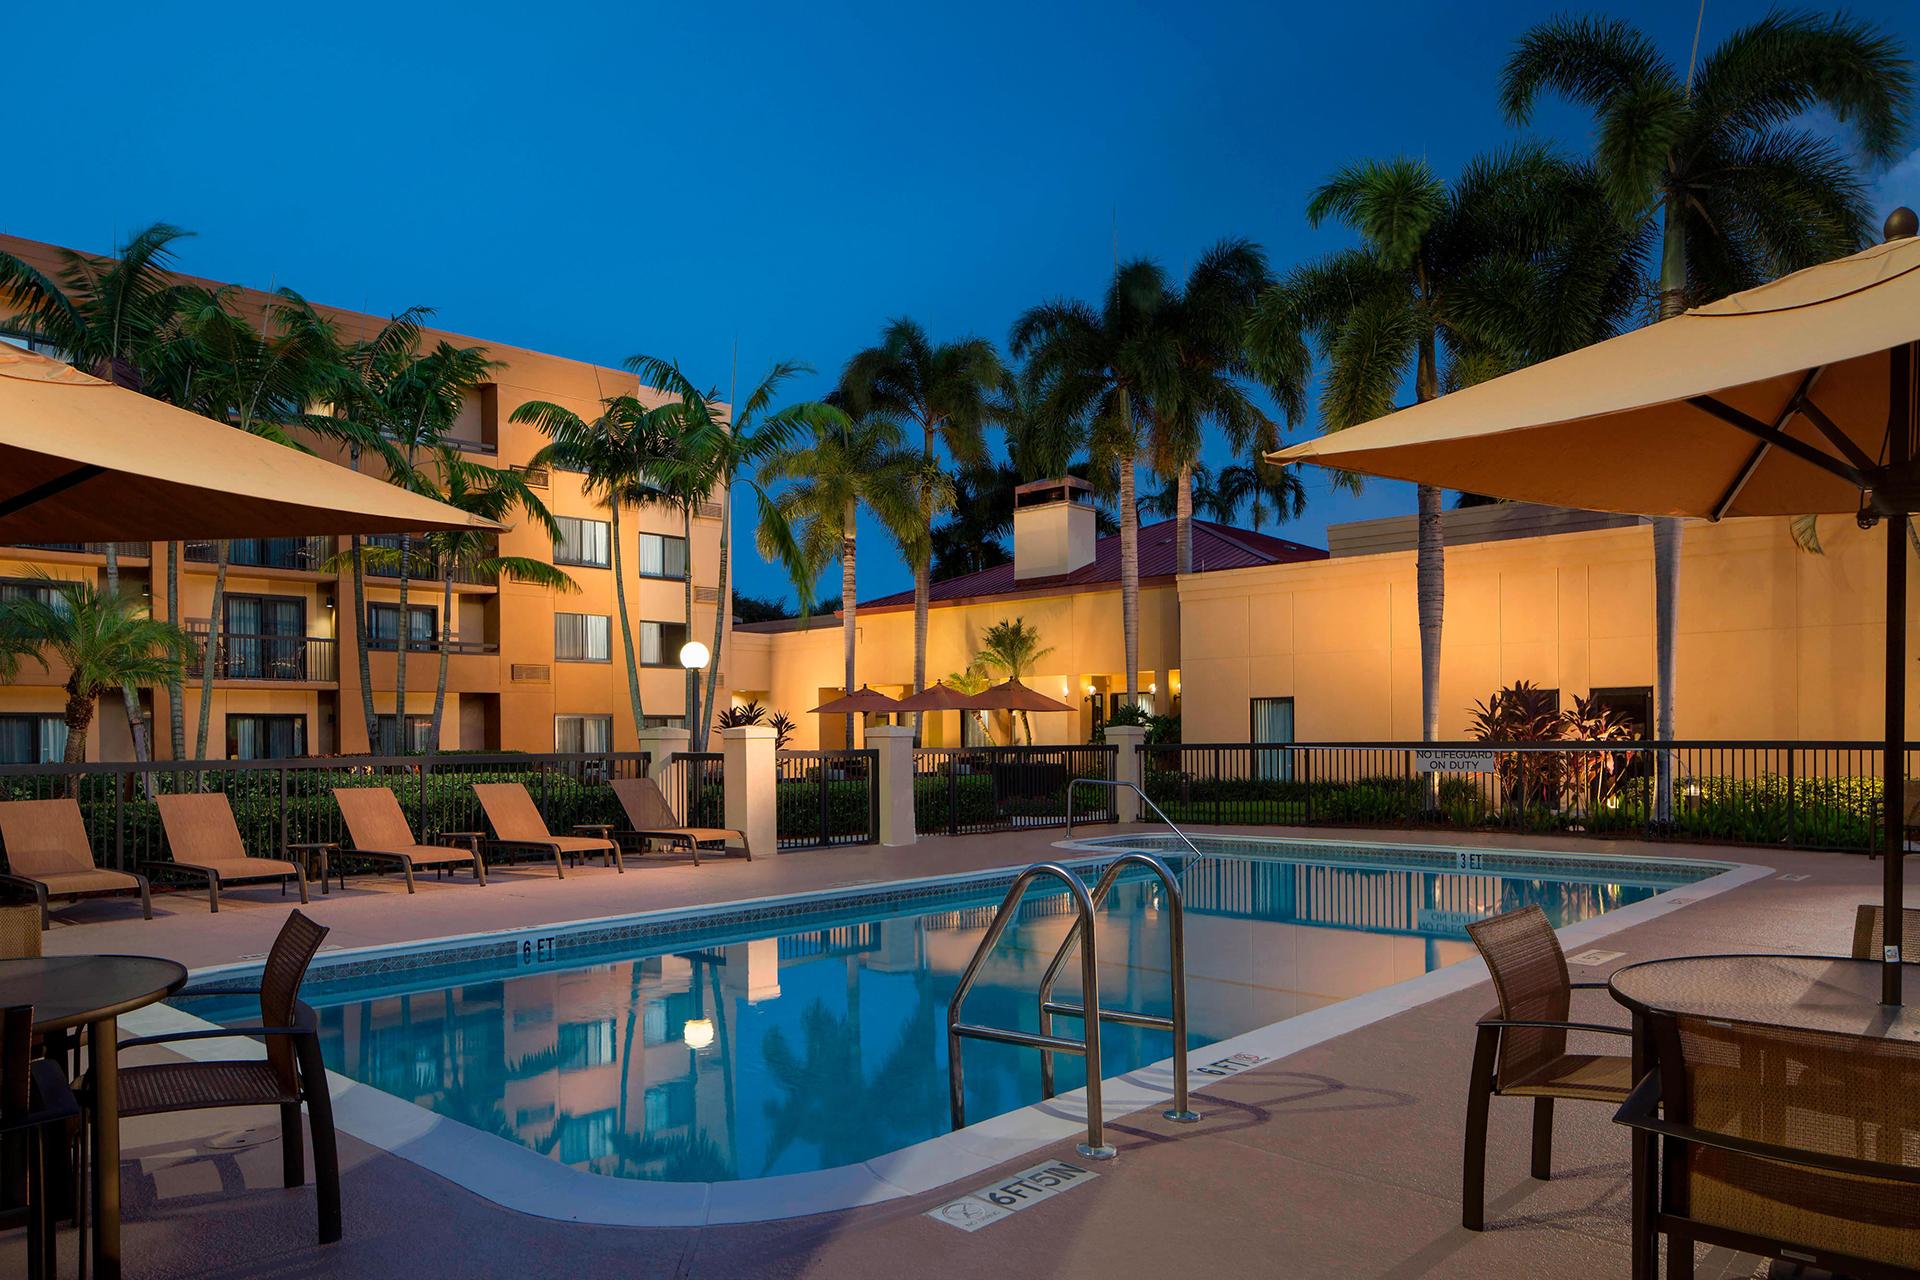 Sonesta Select Outdoor Pool